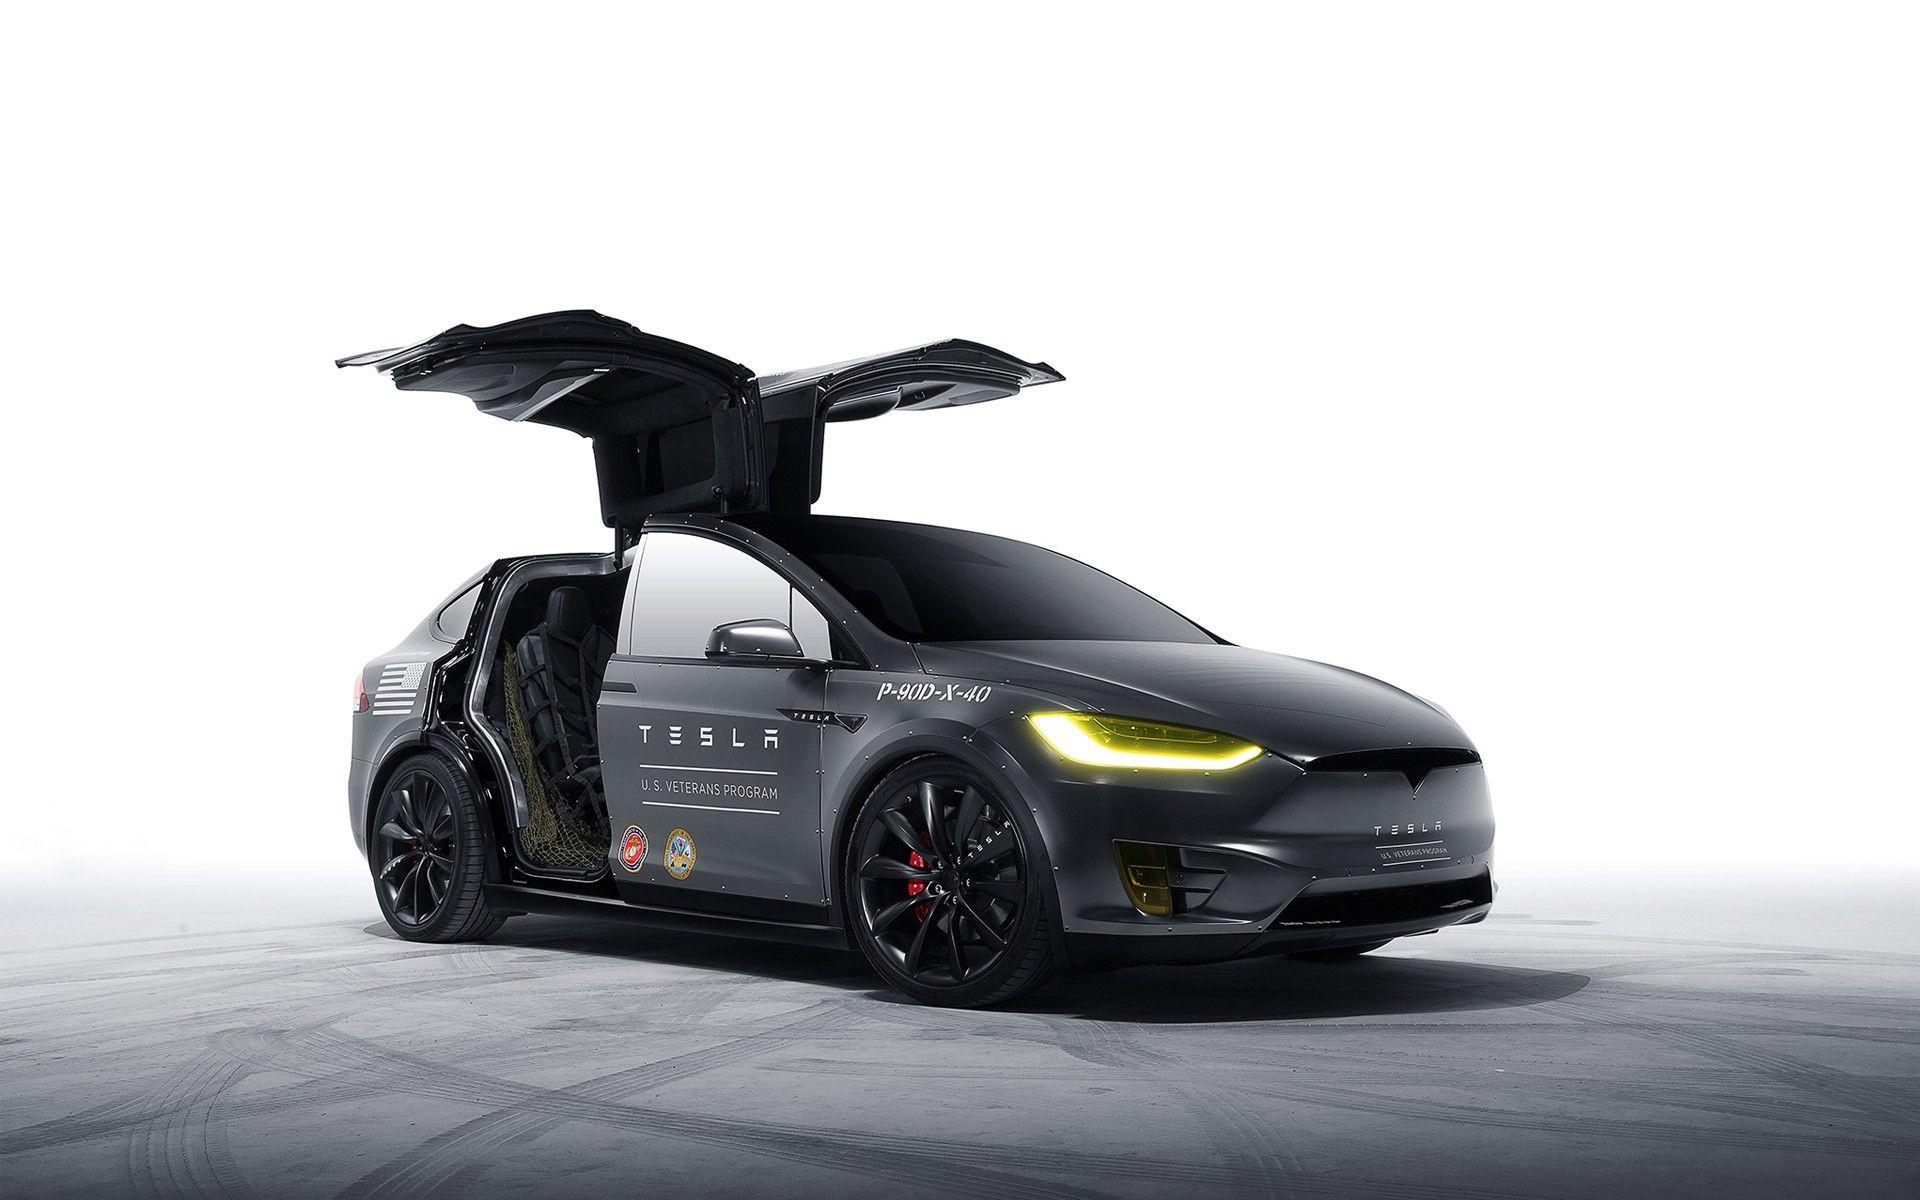 Amazing Backgrounds of Tesla Model S Colelction ID PLAPLA